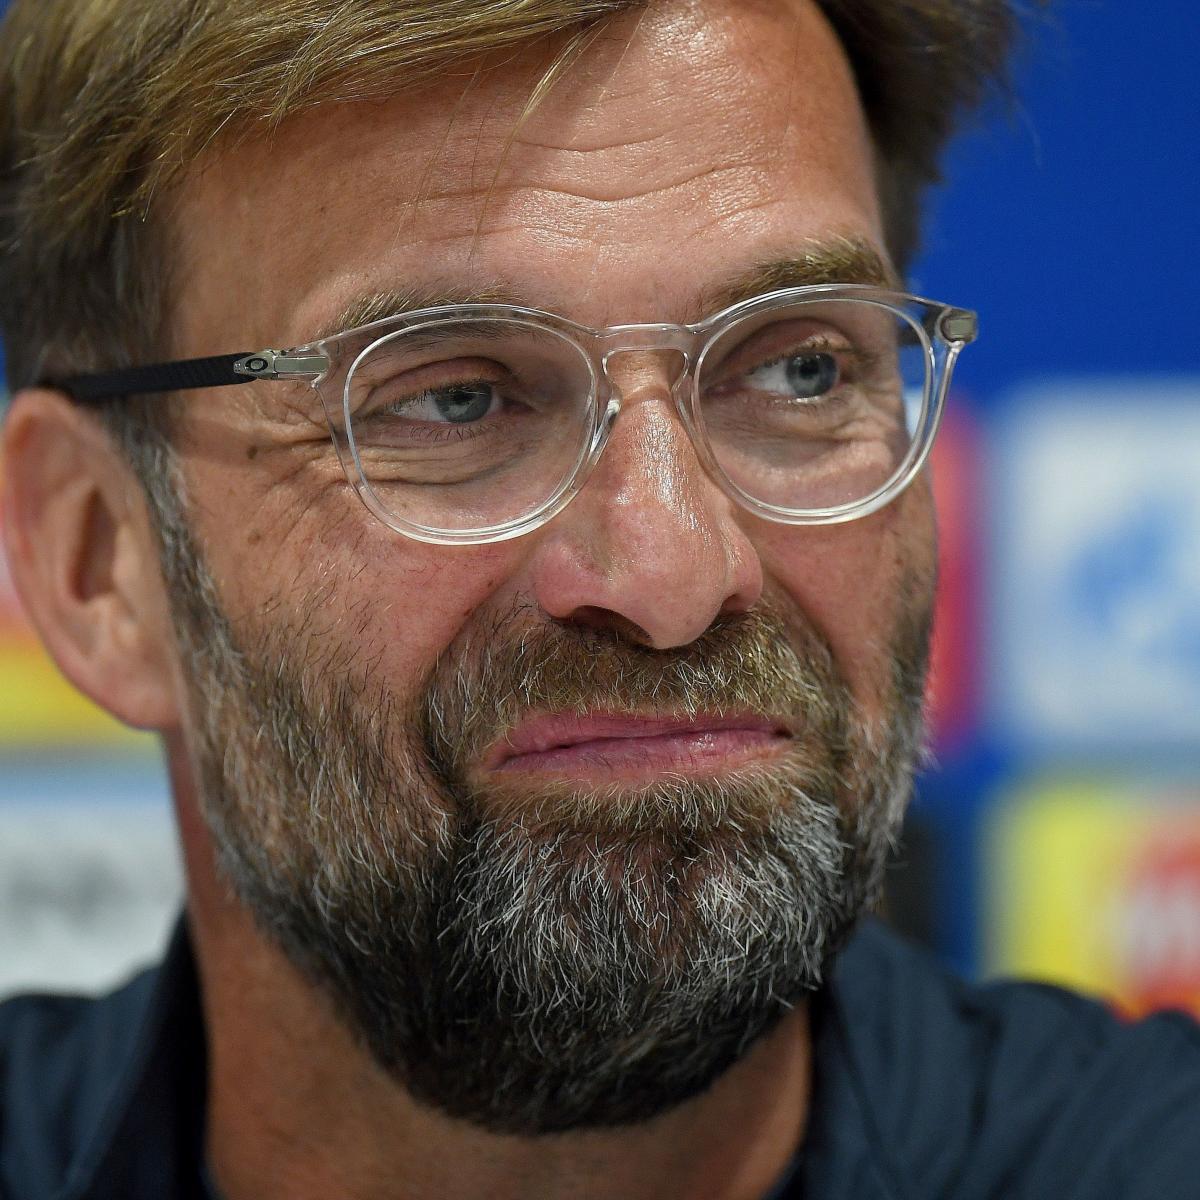 Jurgen Klopp Takes Aim at Gary Neville over Champions League, Discusses Fabinho